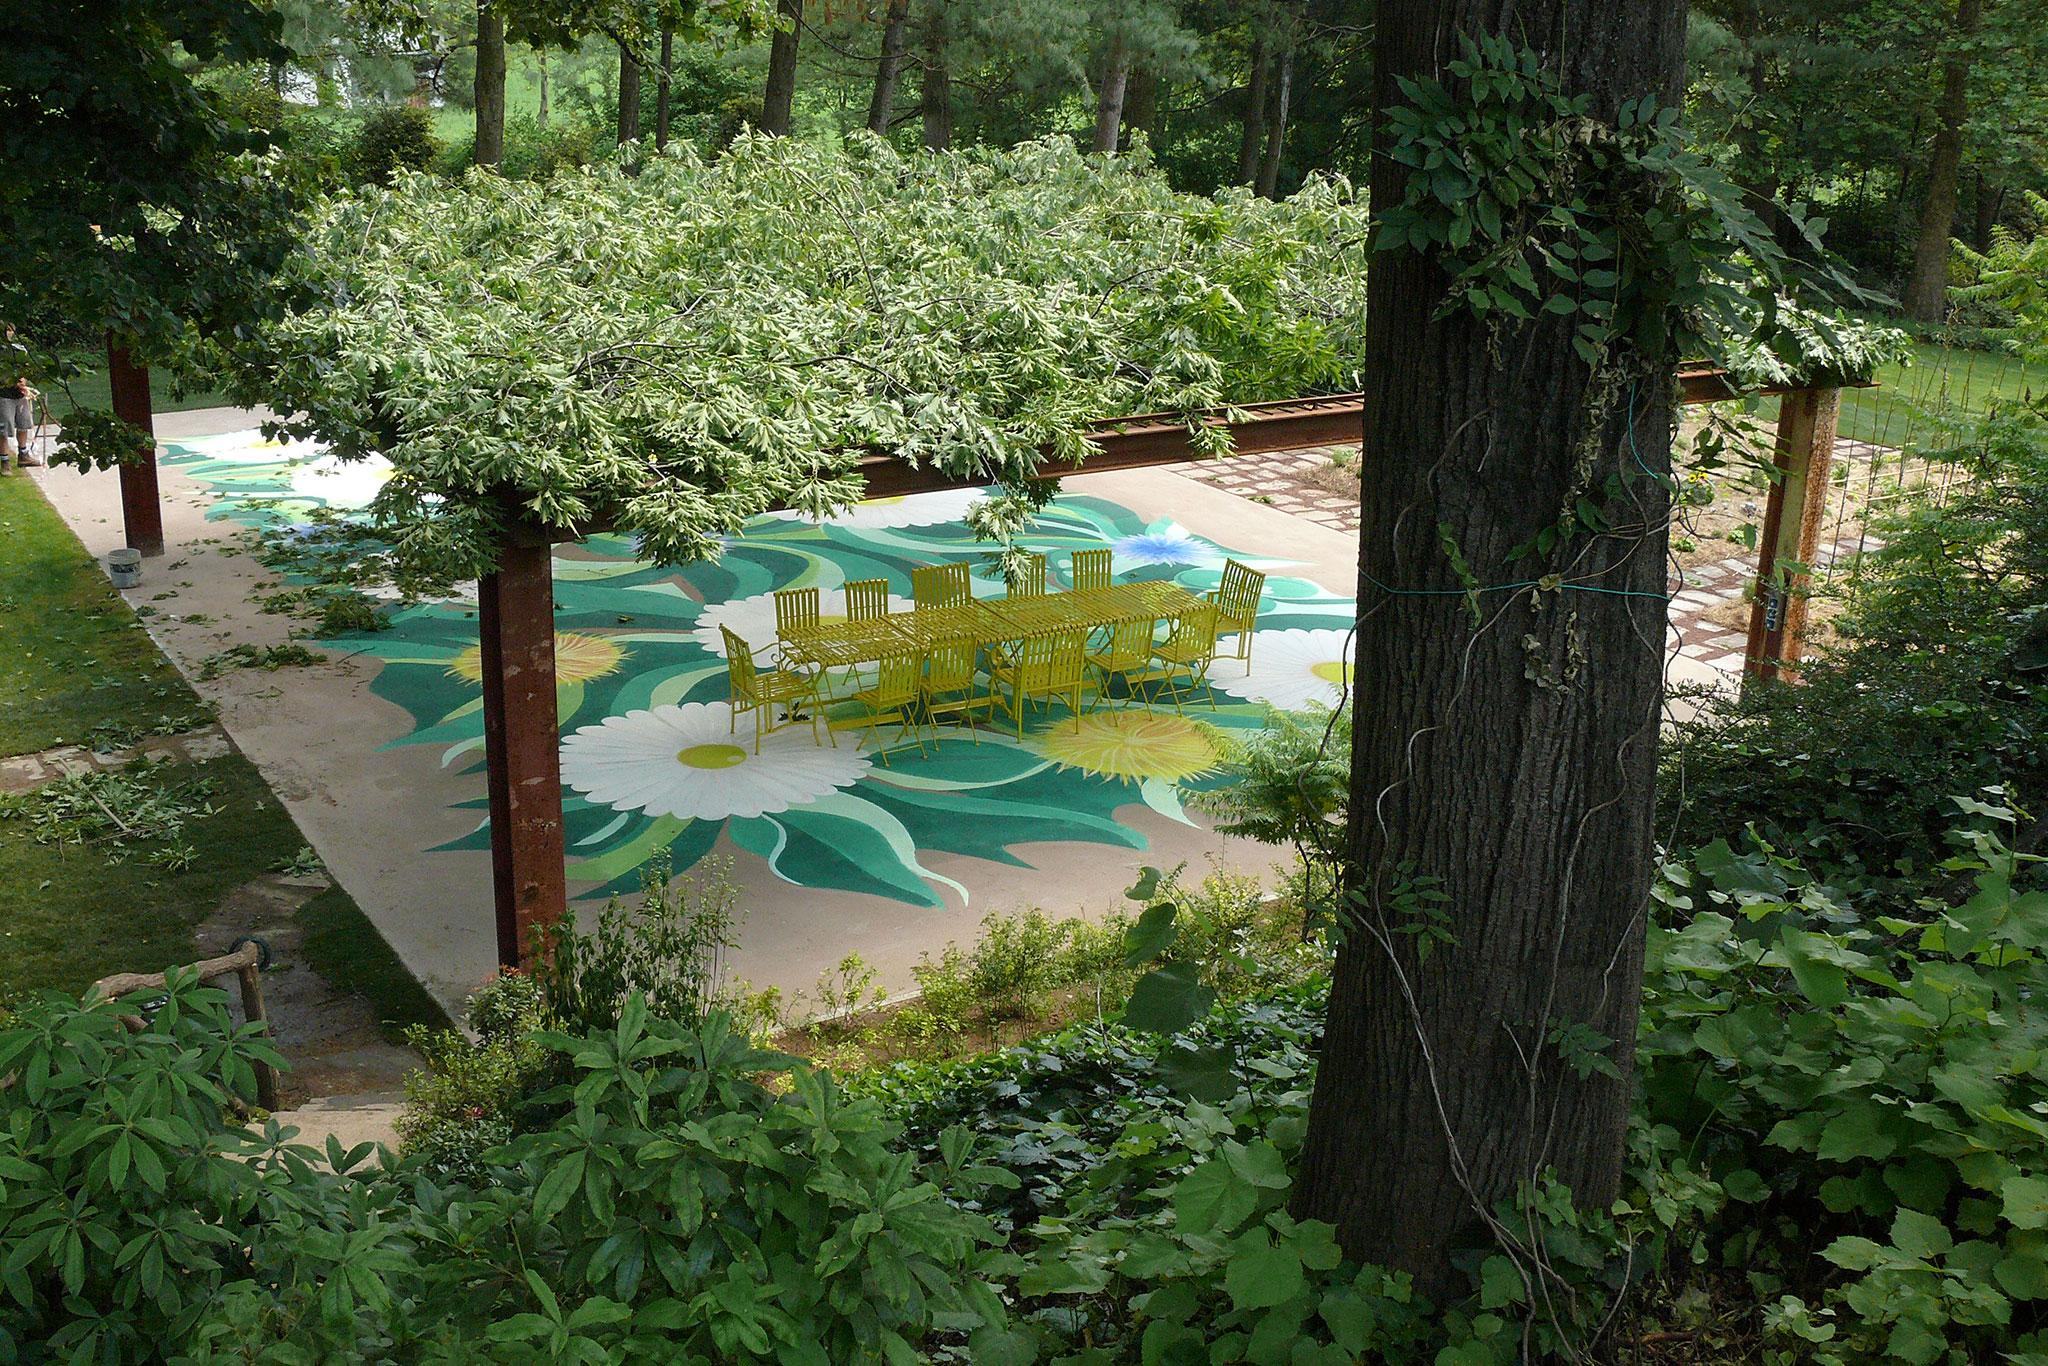 Archiverde-portfolio-giardini-11-def